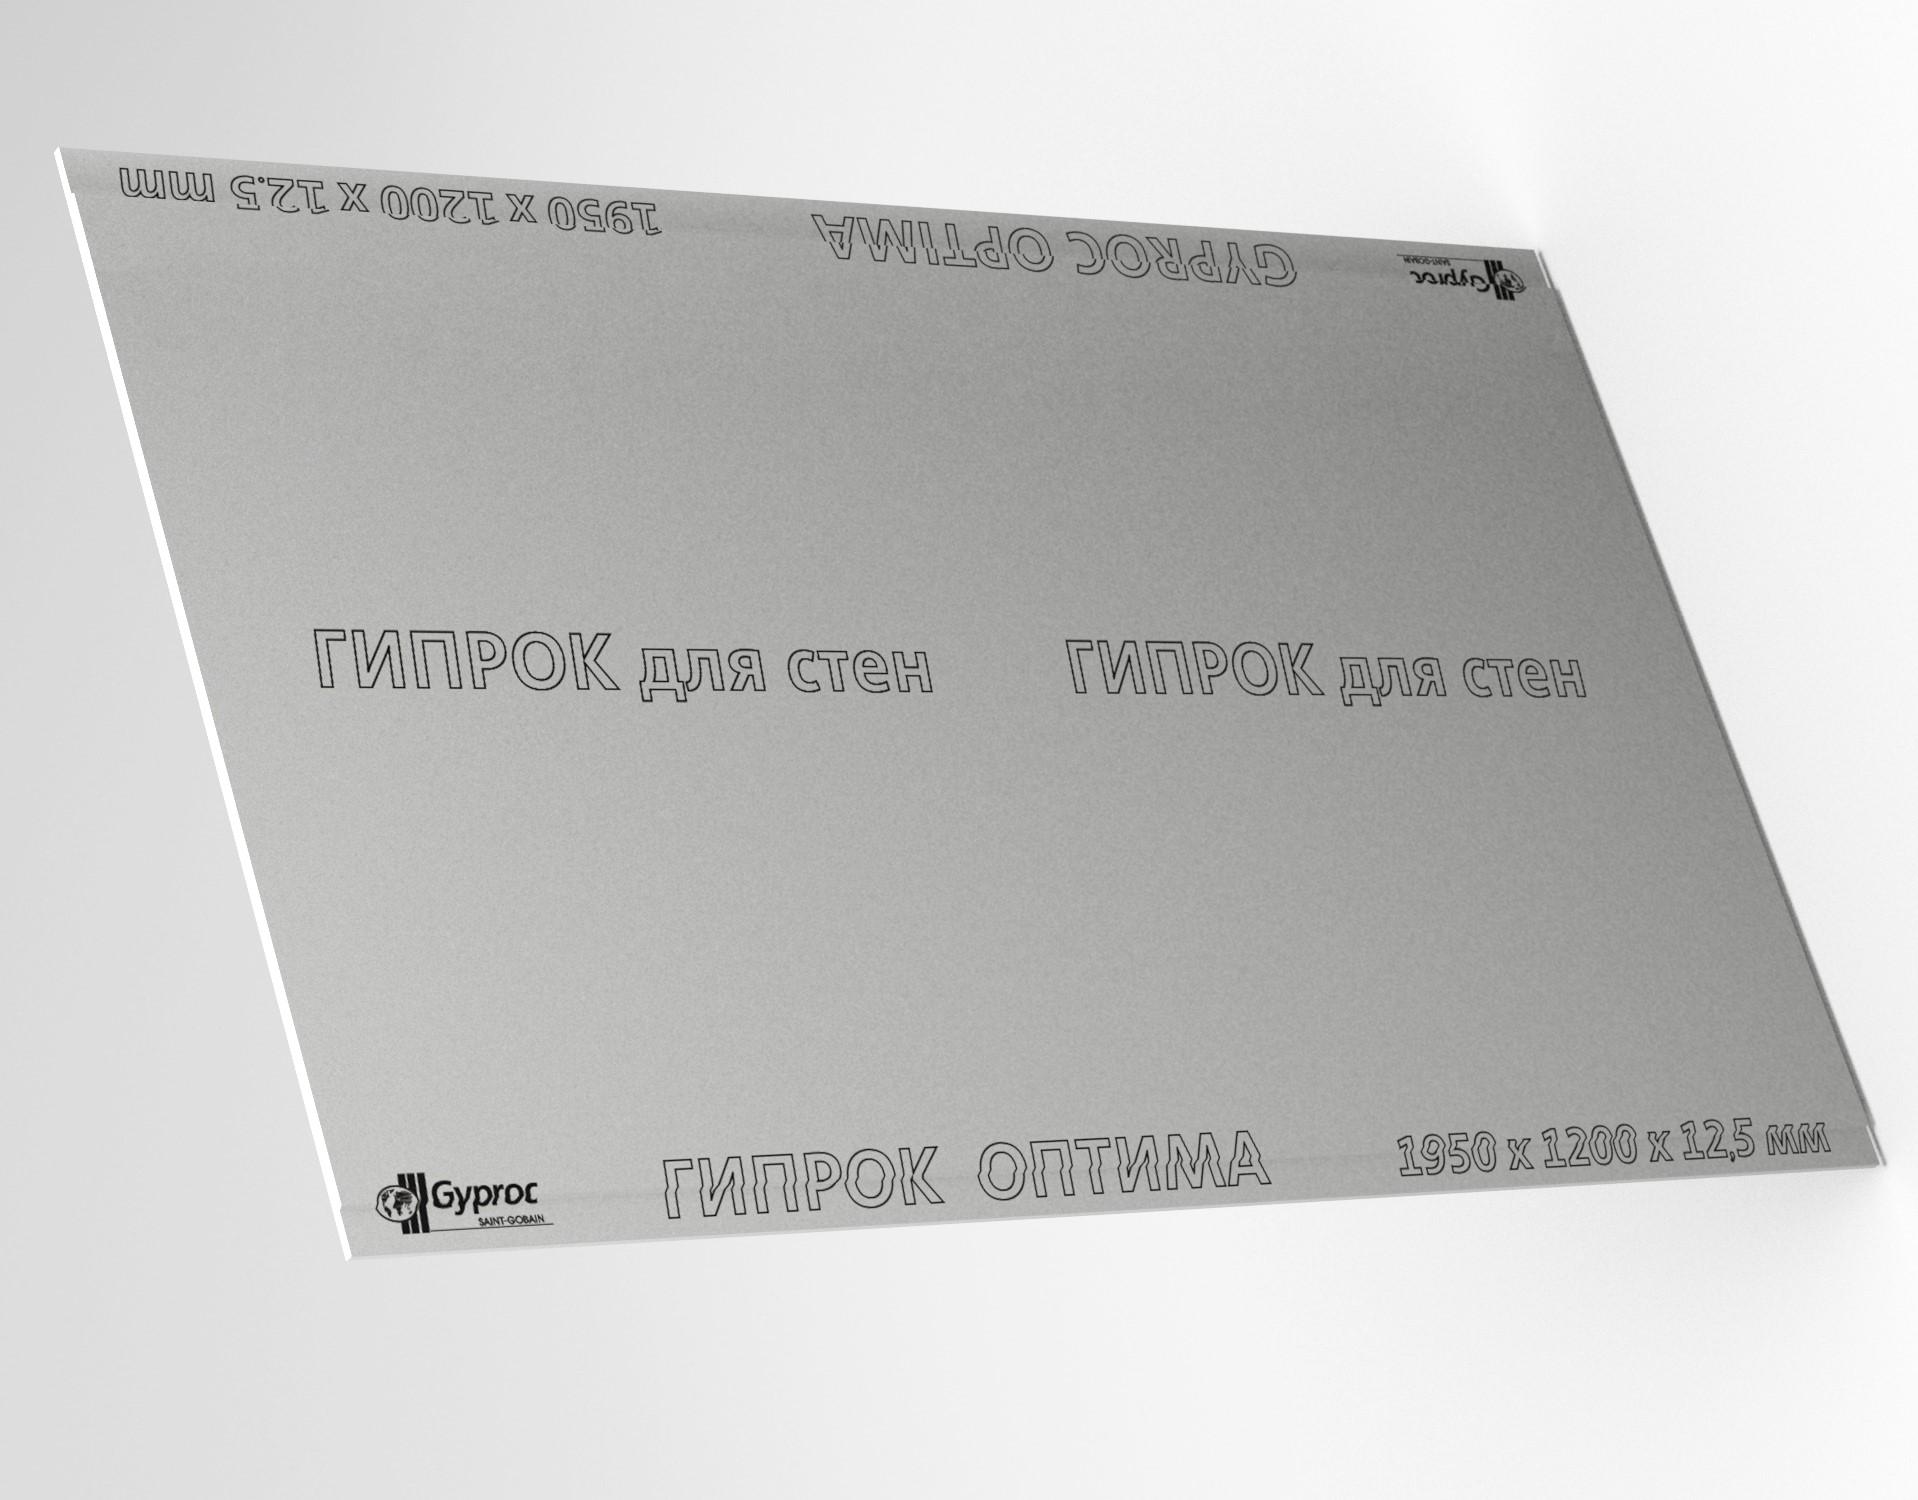 Гипсокартон GYPROC ОПТИМА 1950*1200*12,5 мм - фото